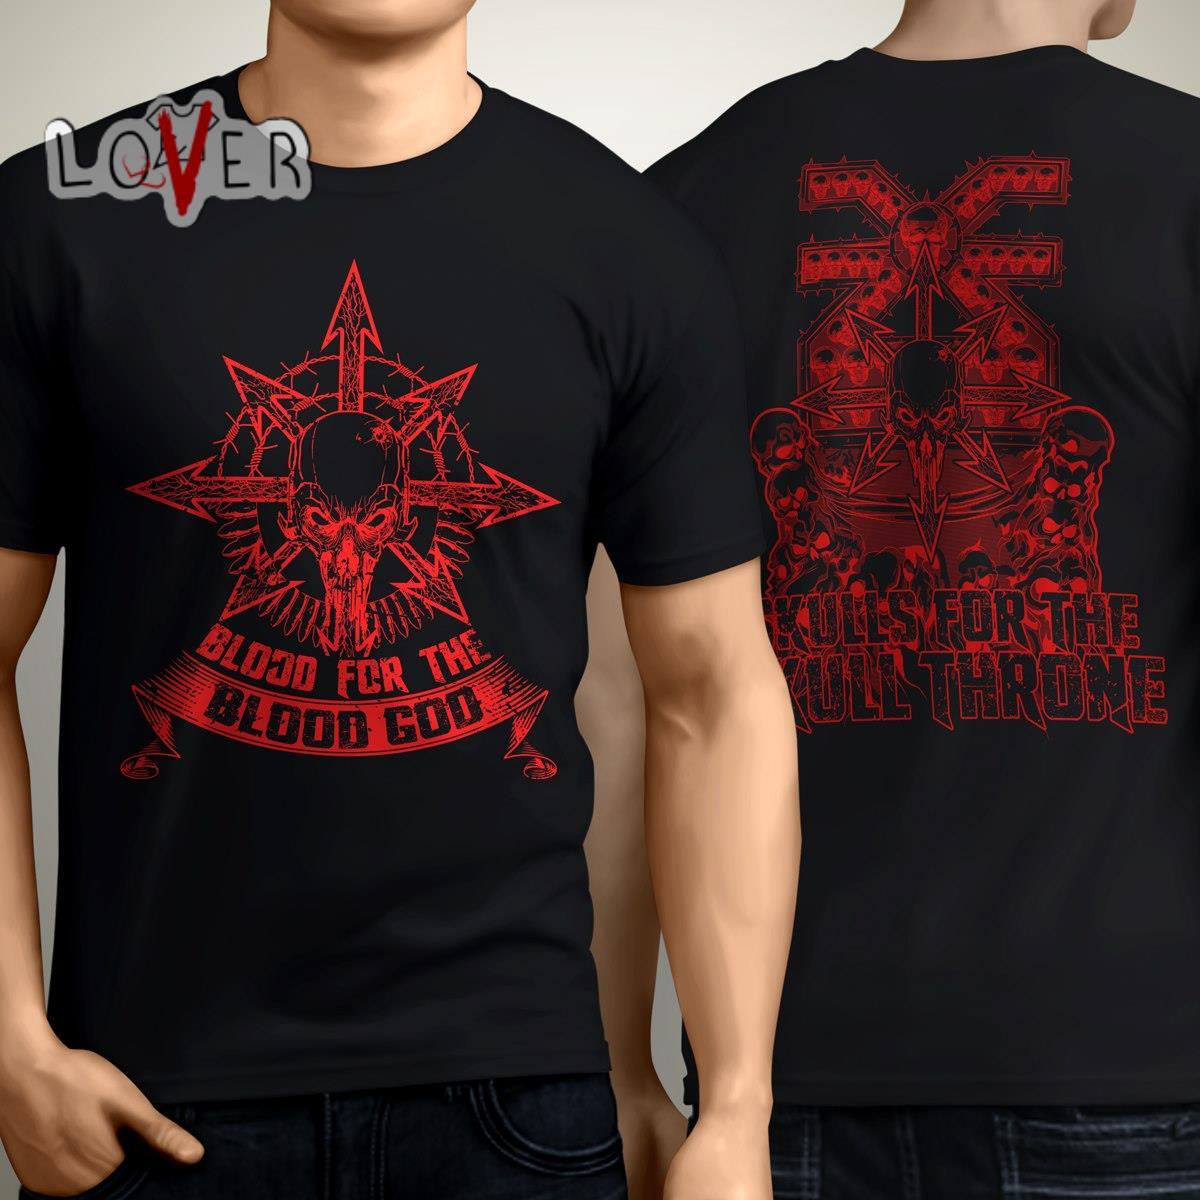 Warhammer Blood for the blood god skulls for the skull throne shirt